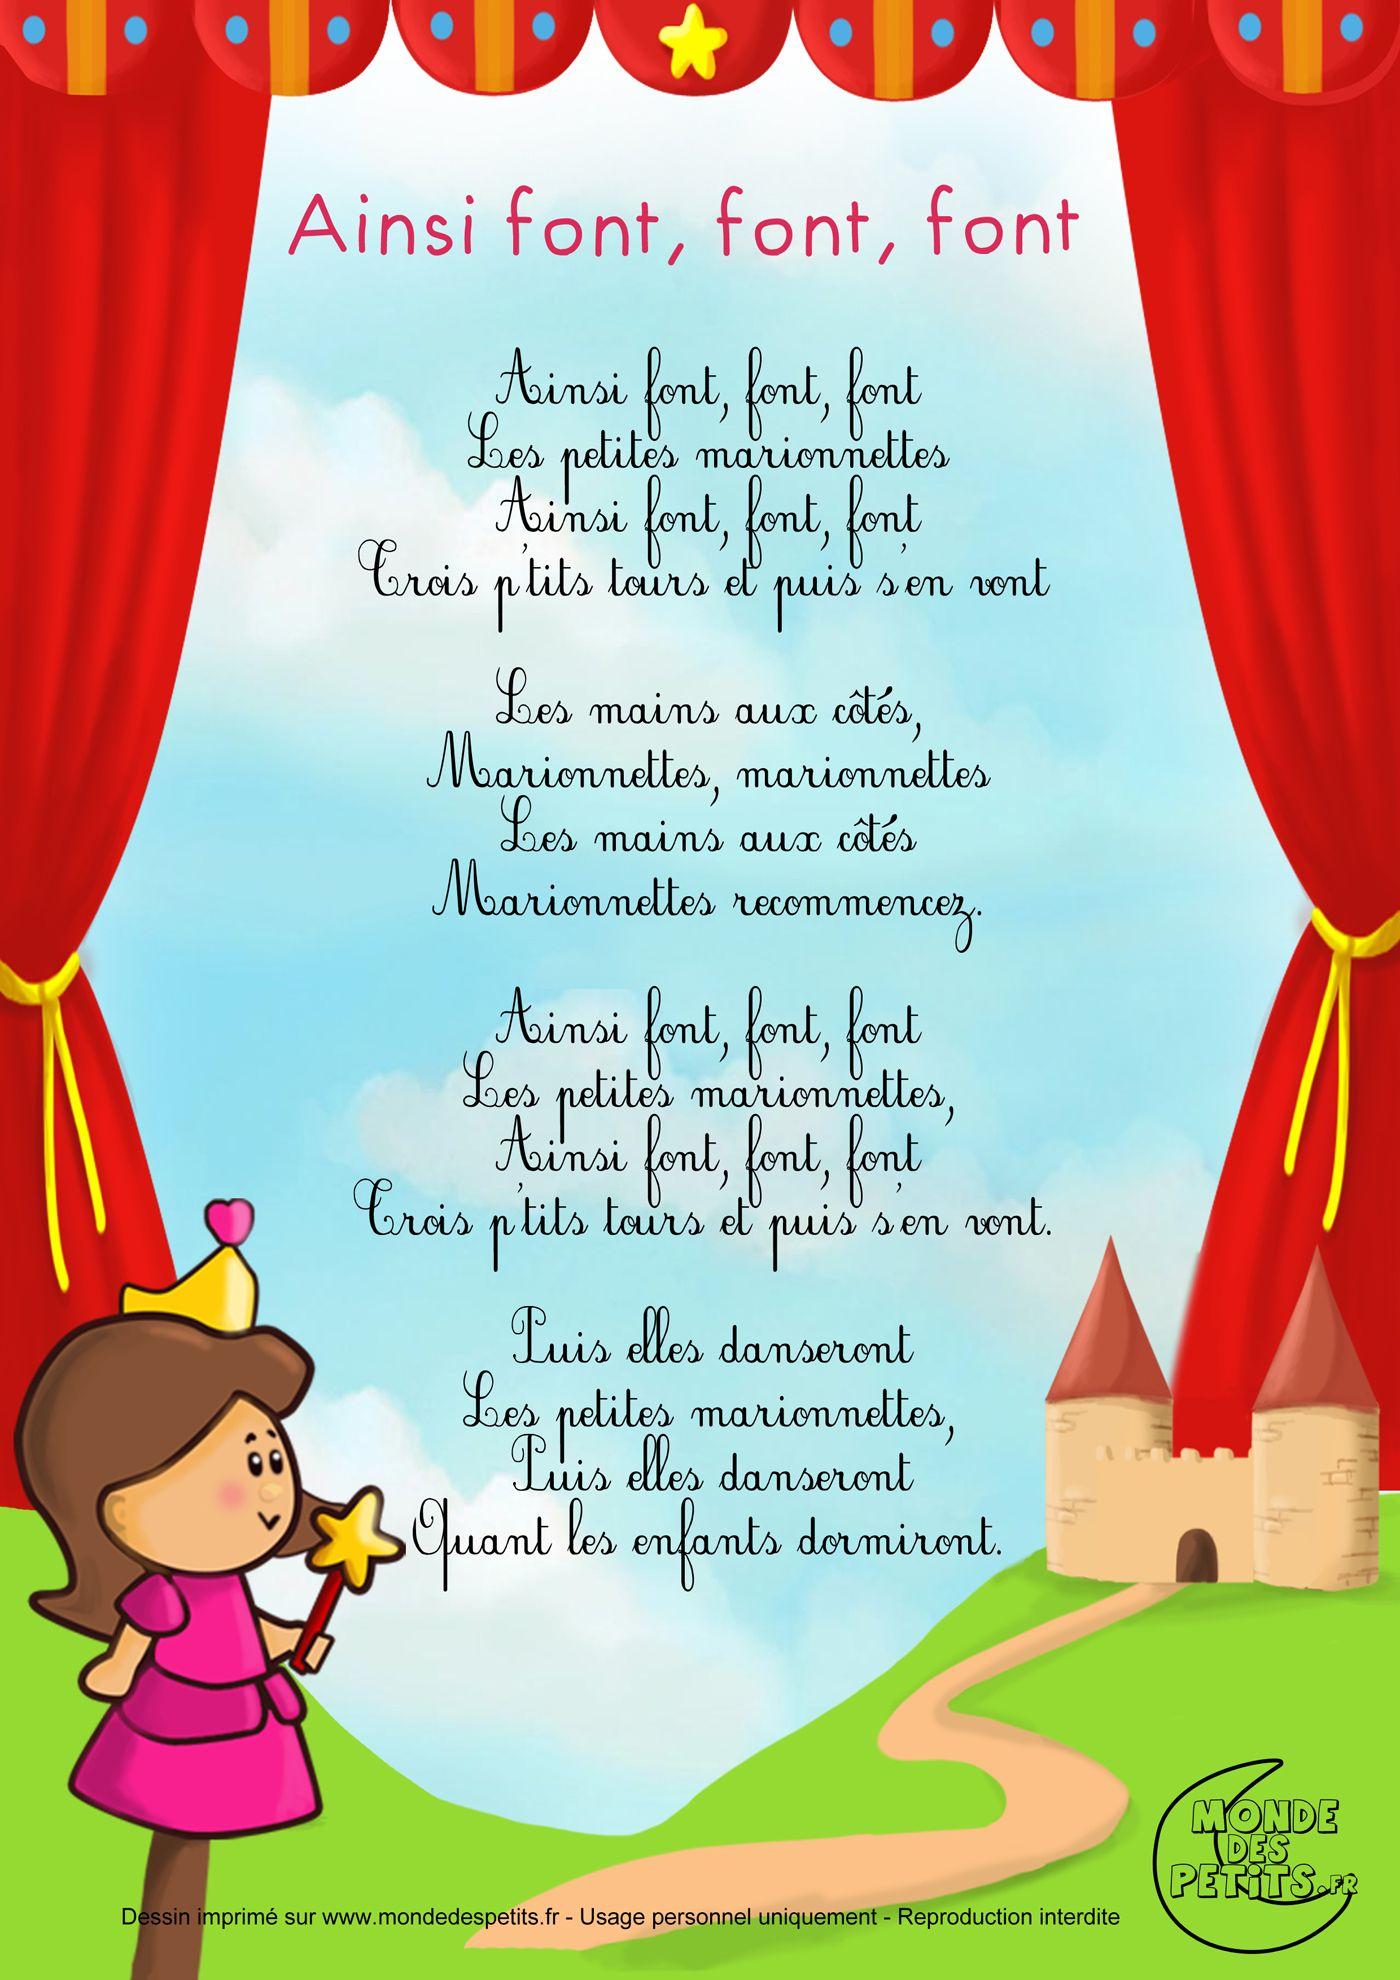 Paroles_Ainsi Font, Font, Font, Les Petites Marionnettes encequiconcerne Les Petites Marionnettes Chanson